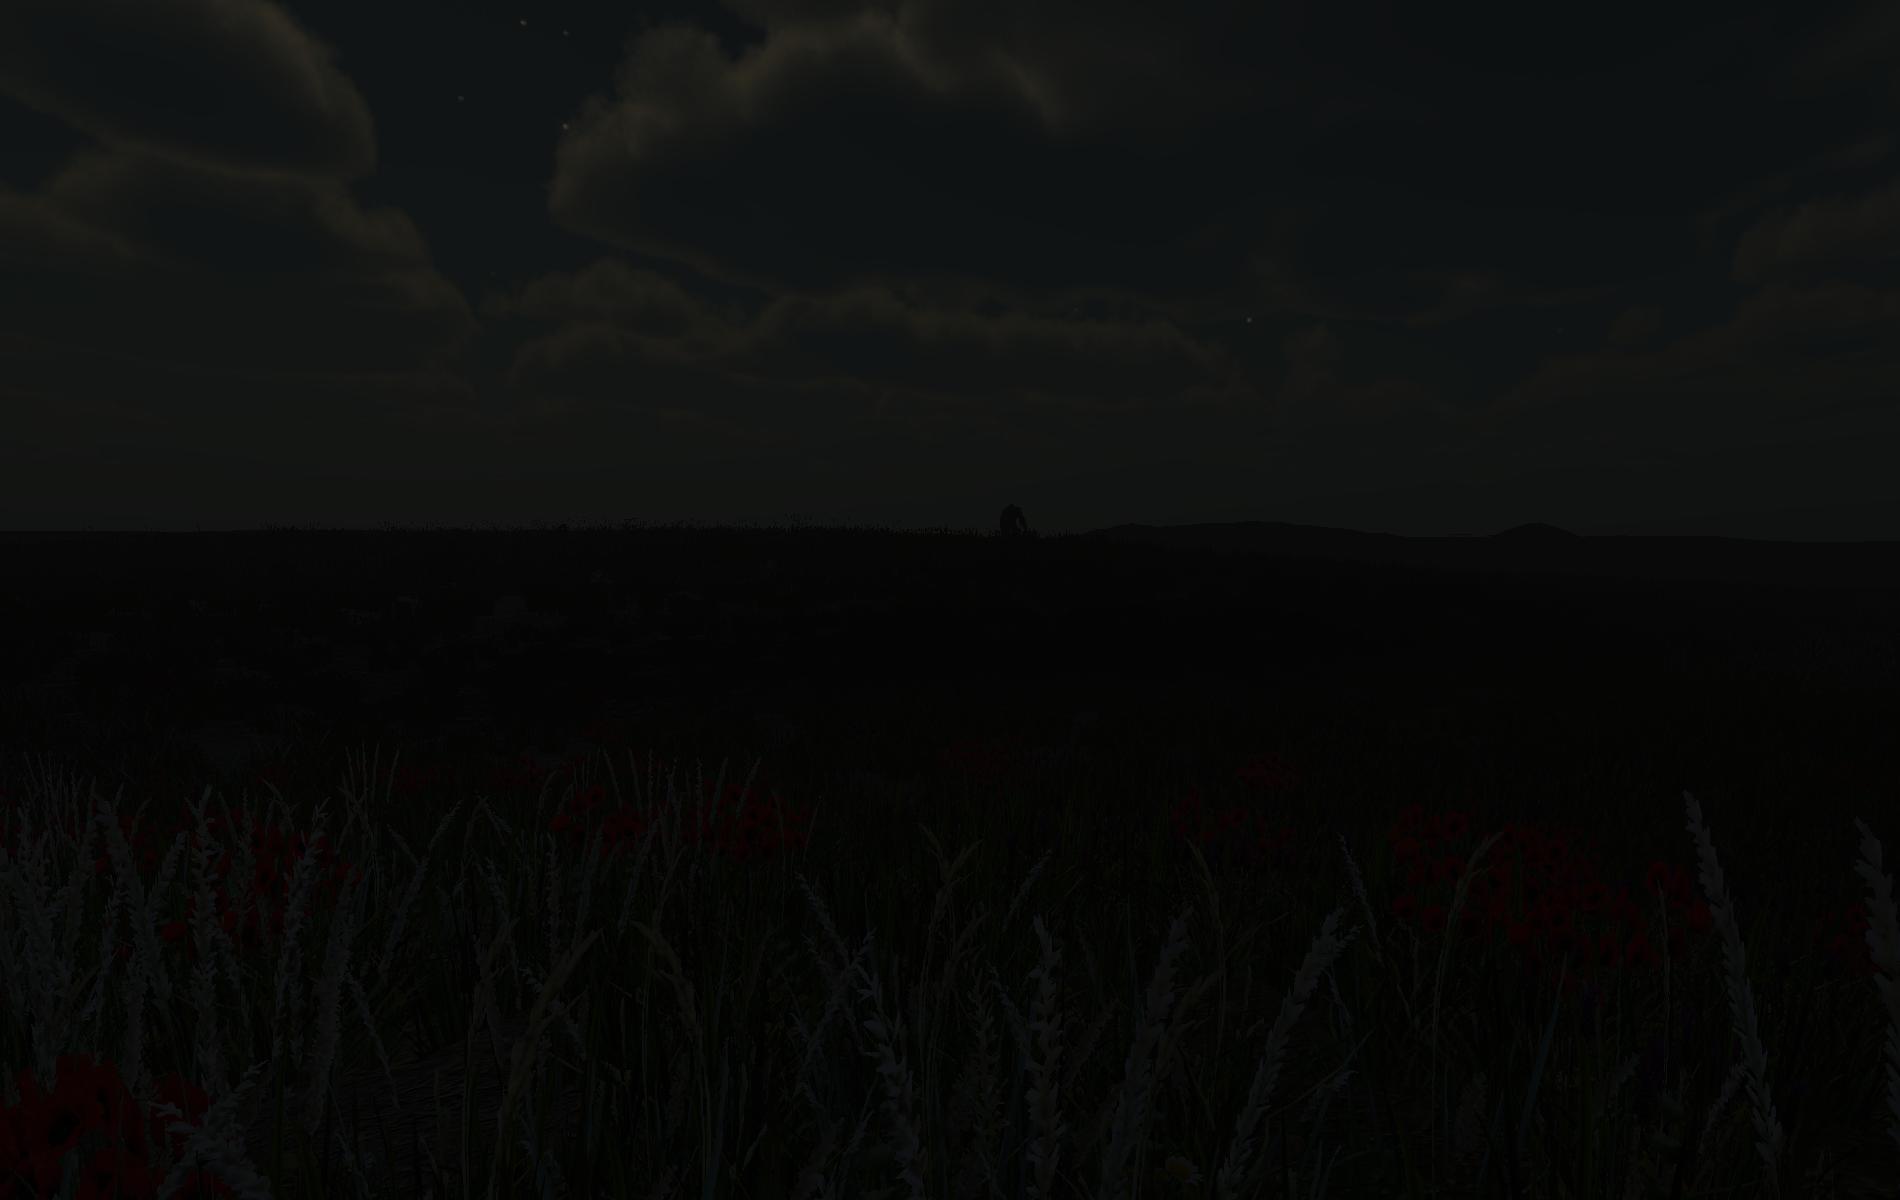 Night view of far away creature